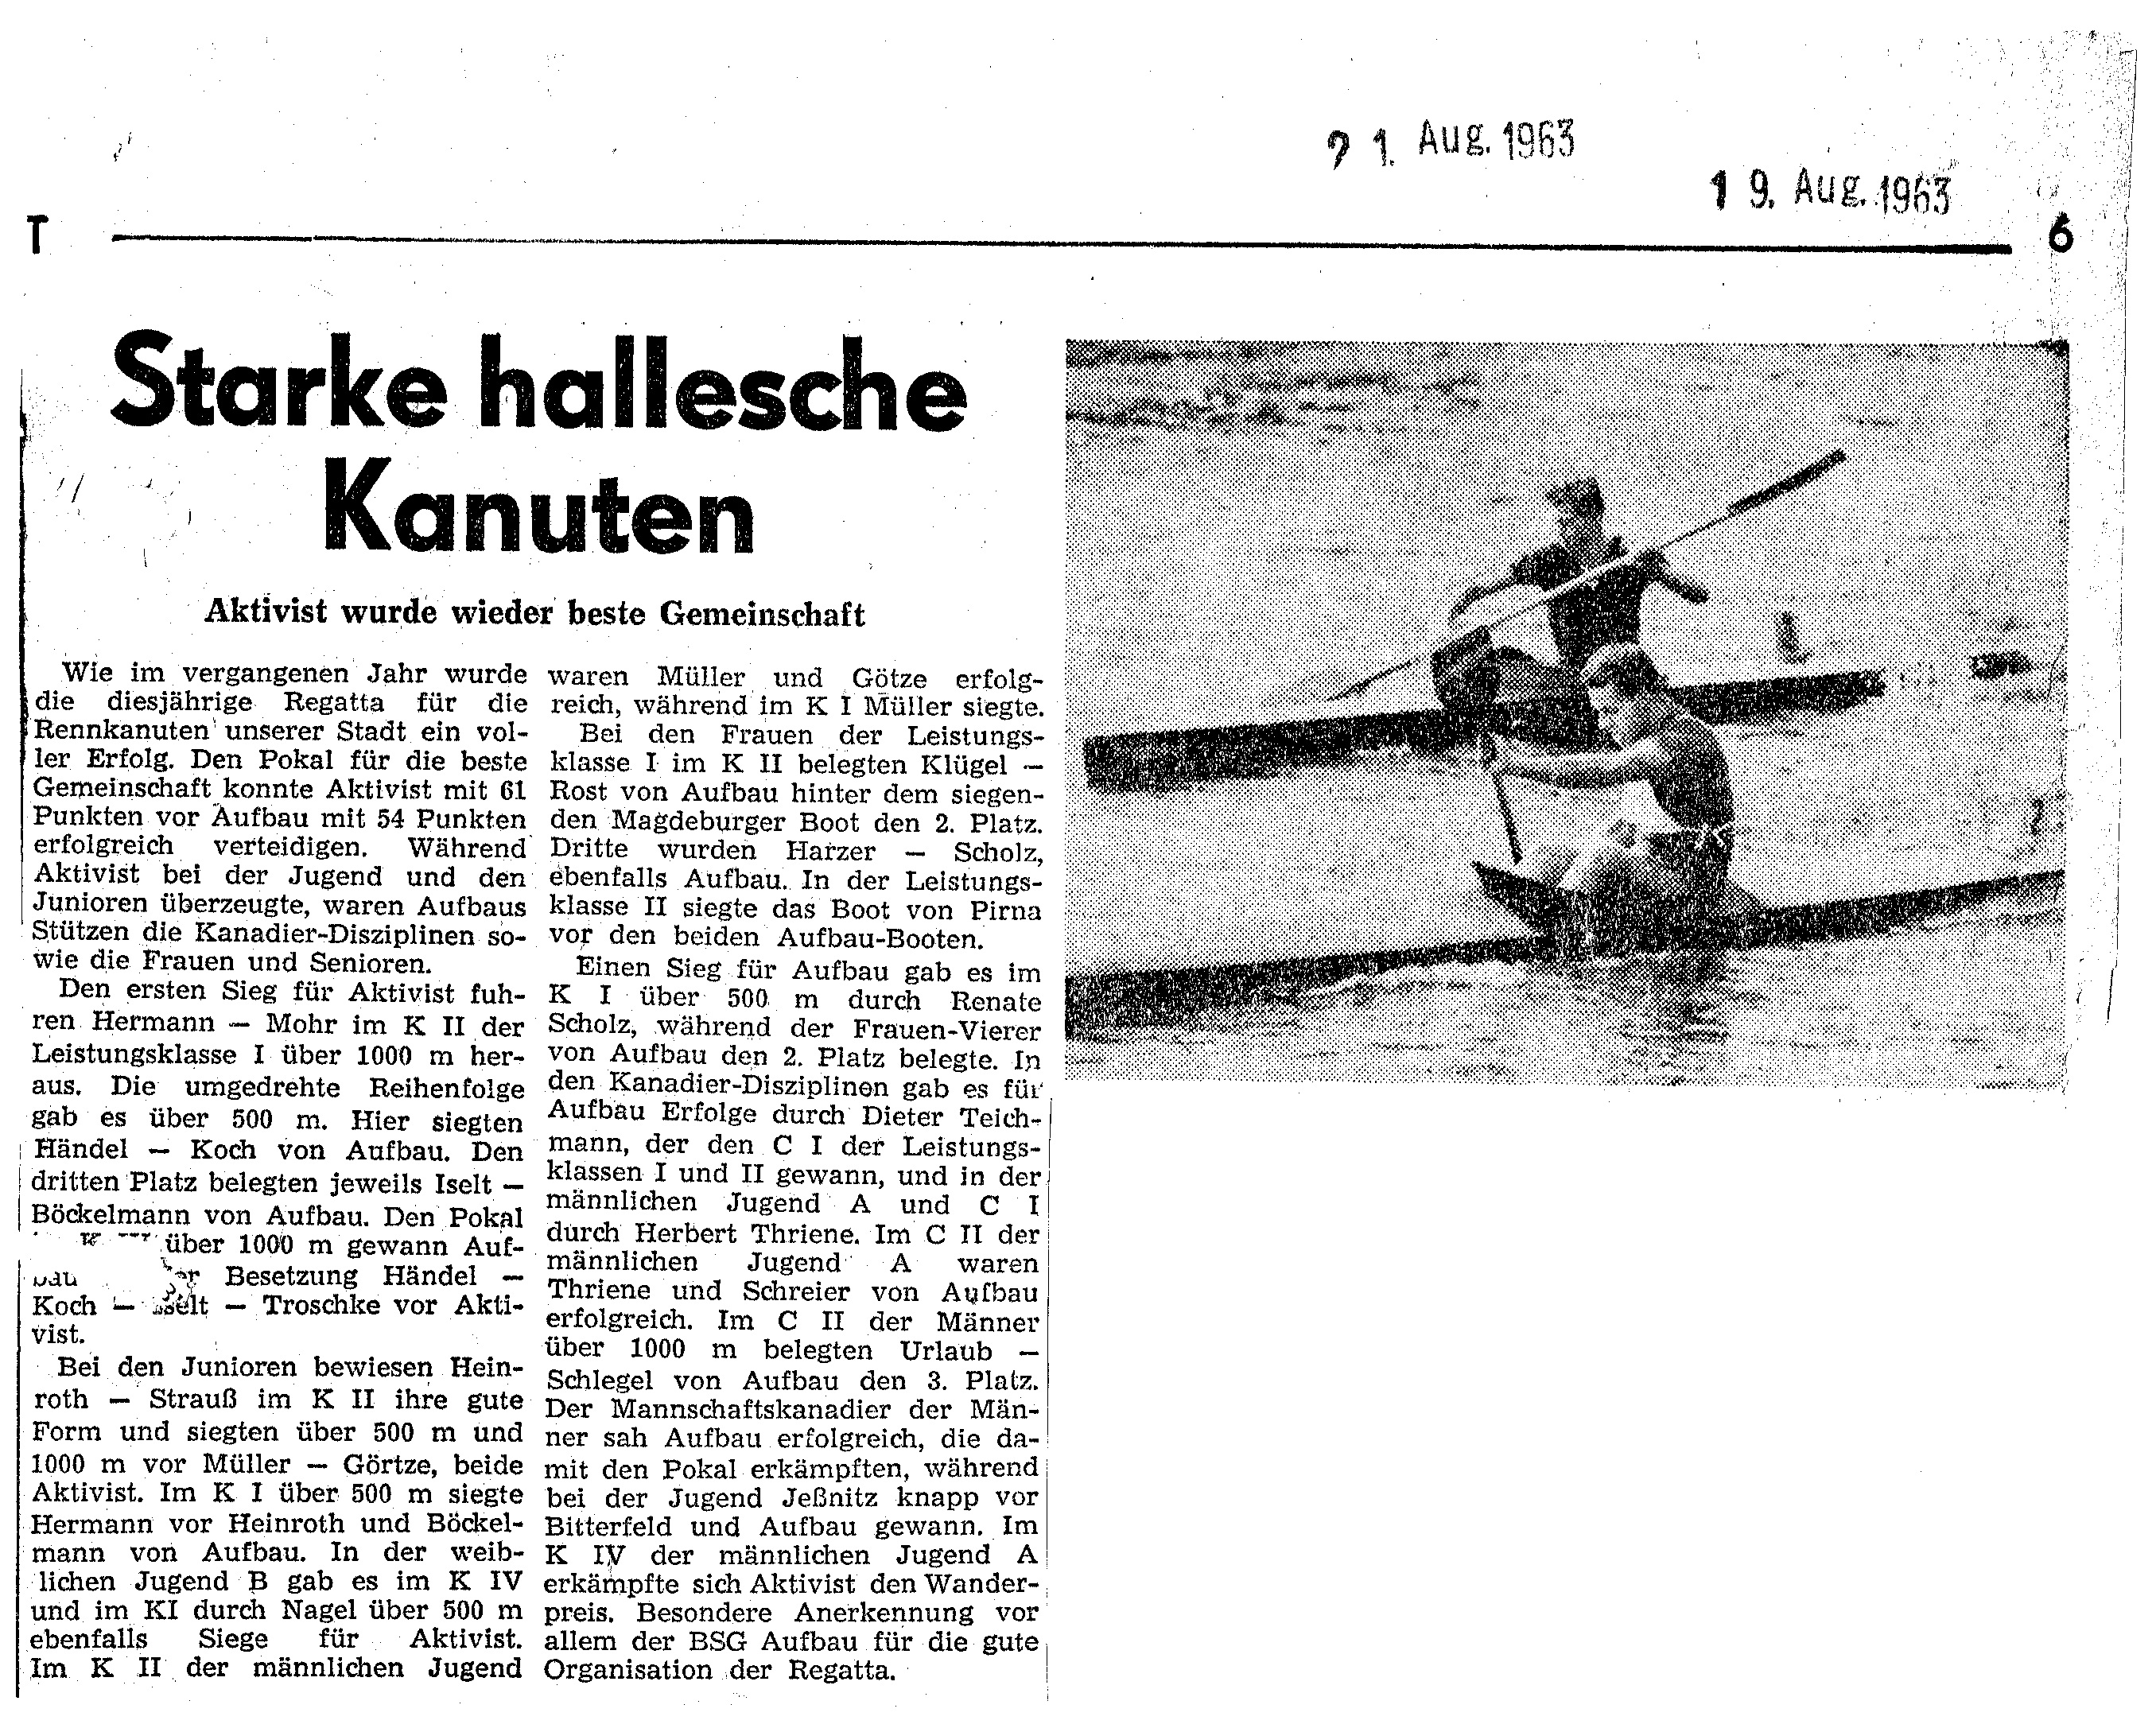 1963-08-19 Starke hallesche Kanuten